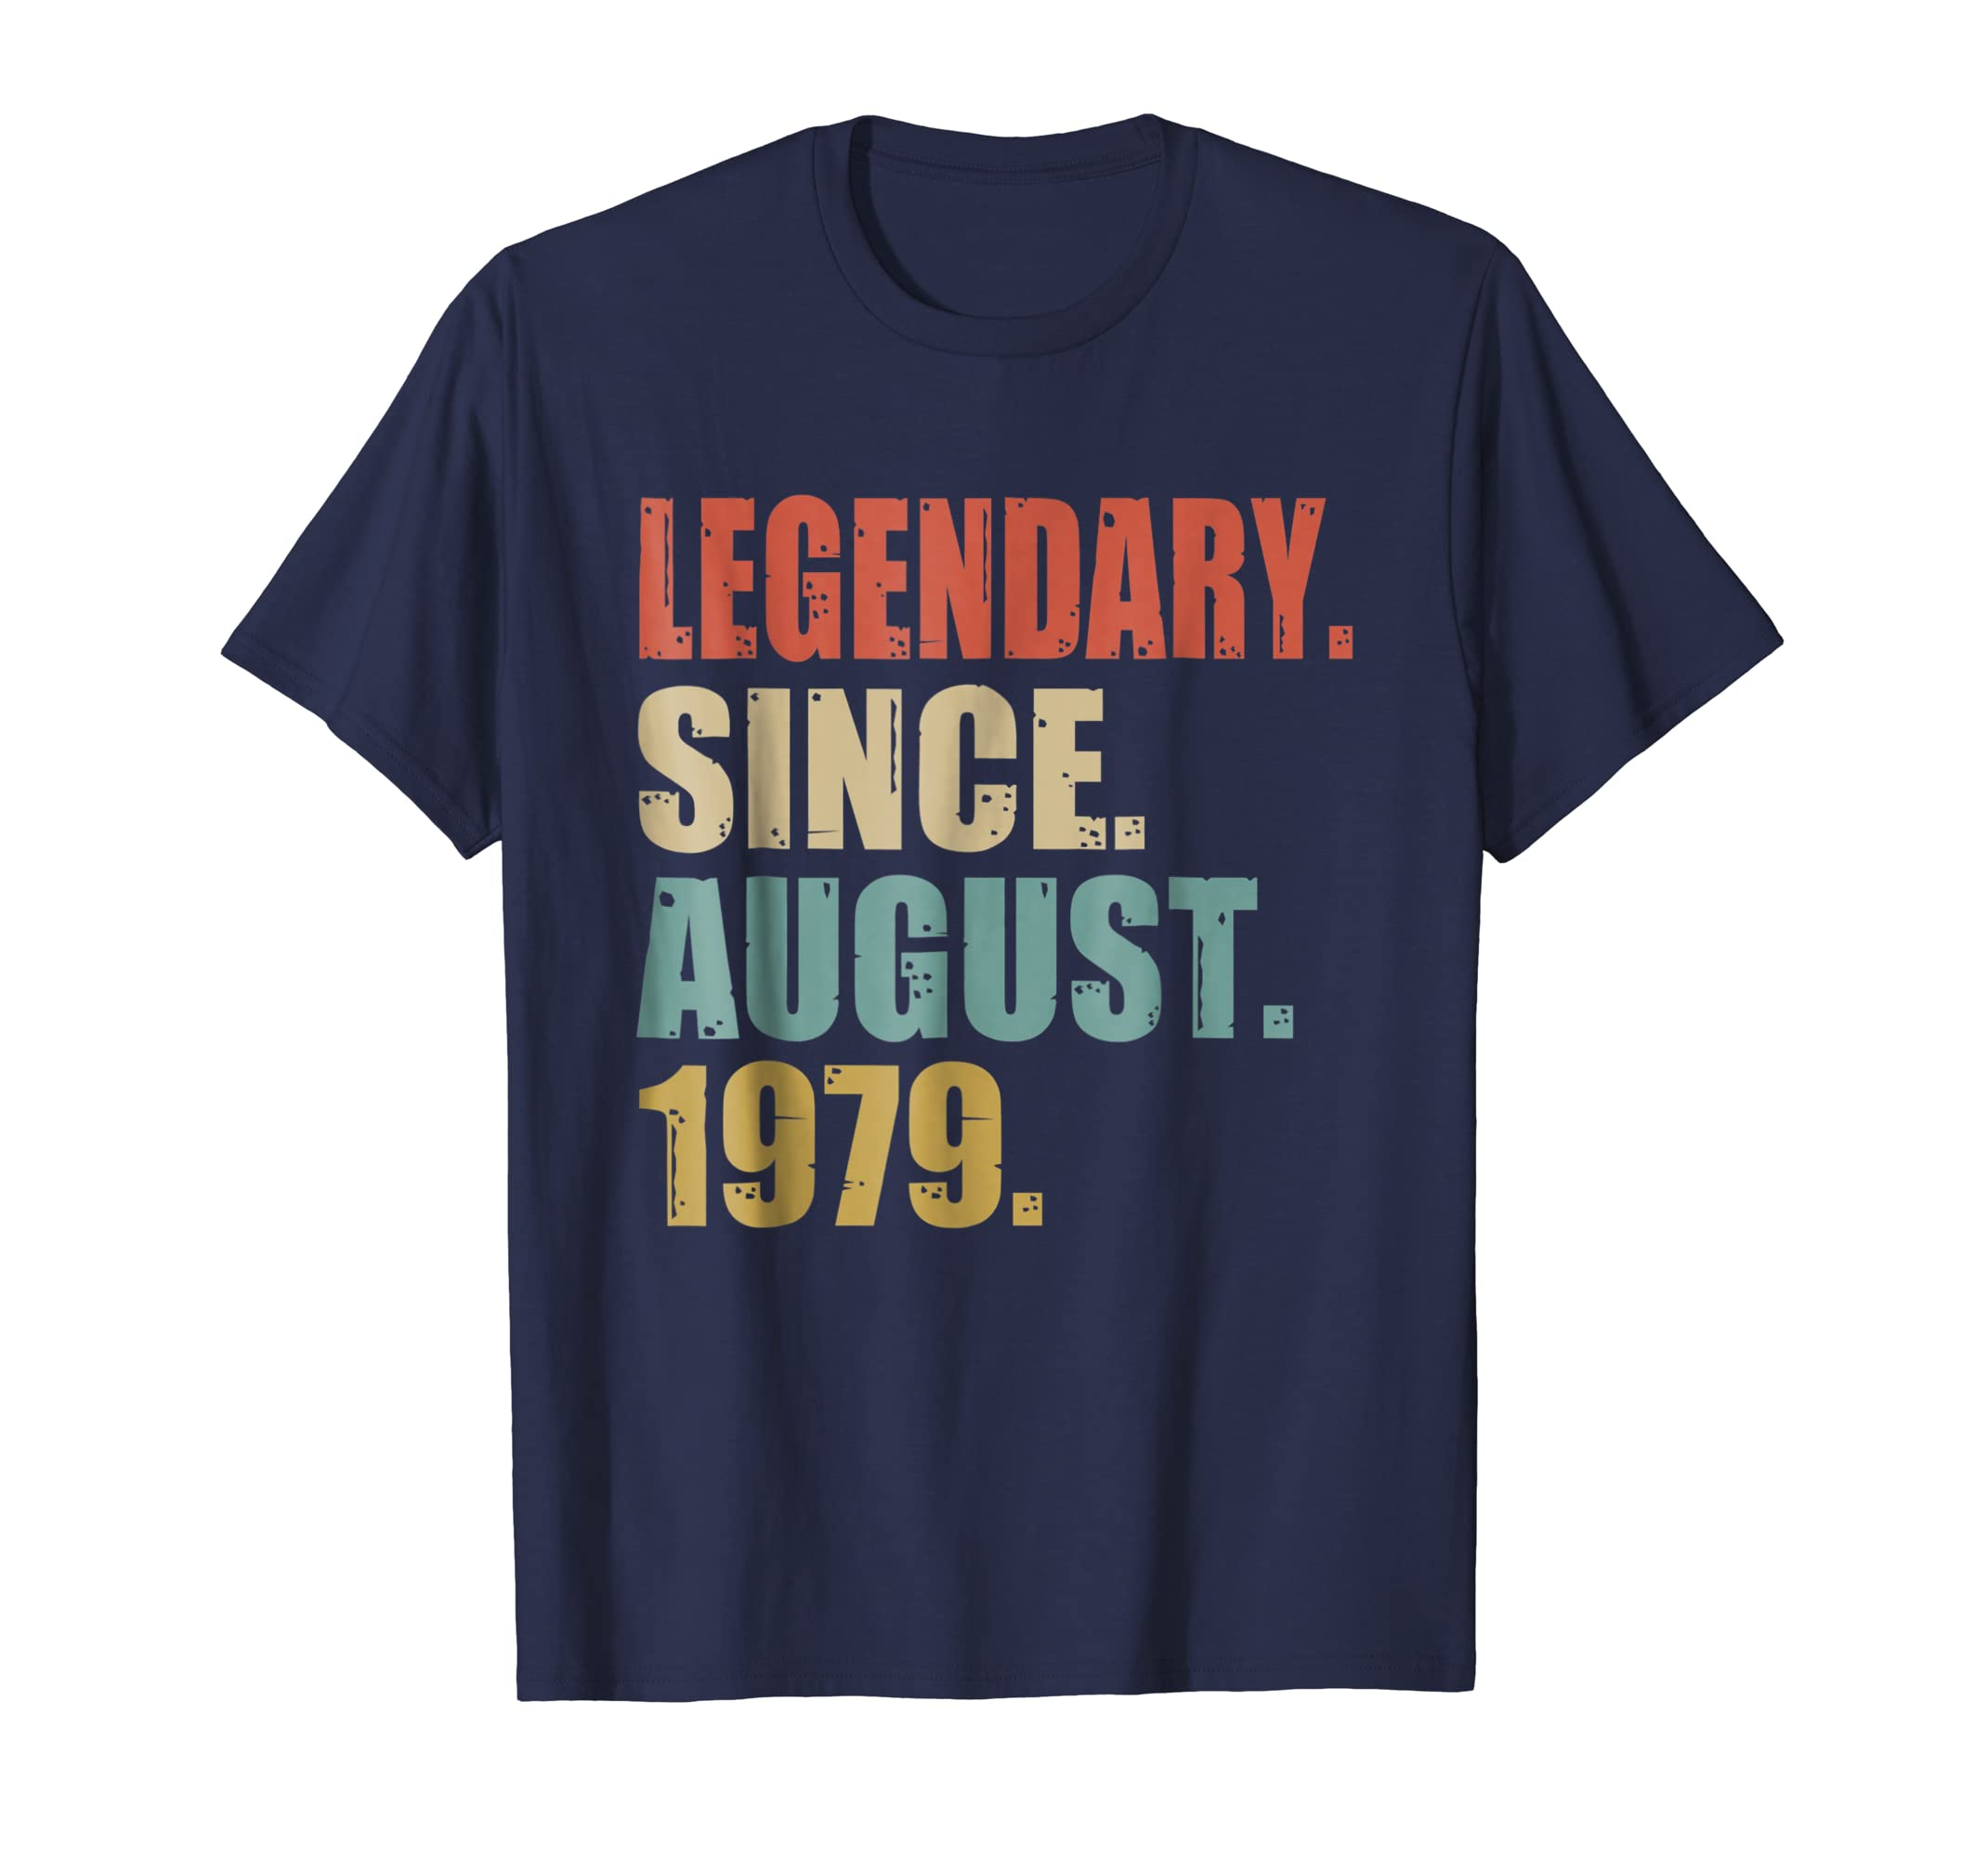 39th Birthday Gifts Retro Legendary Since August 1979 Shirt-Awarplus